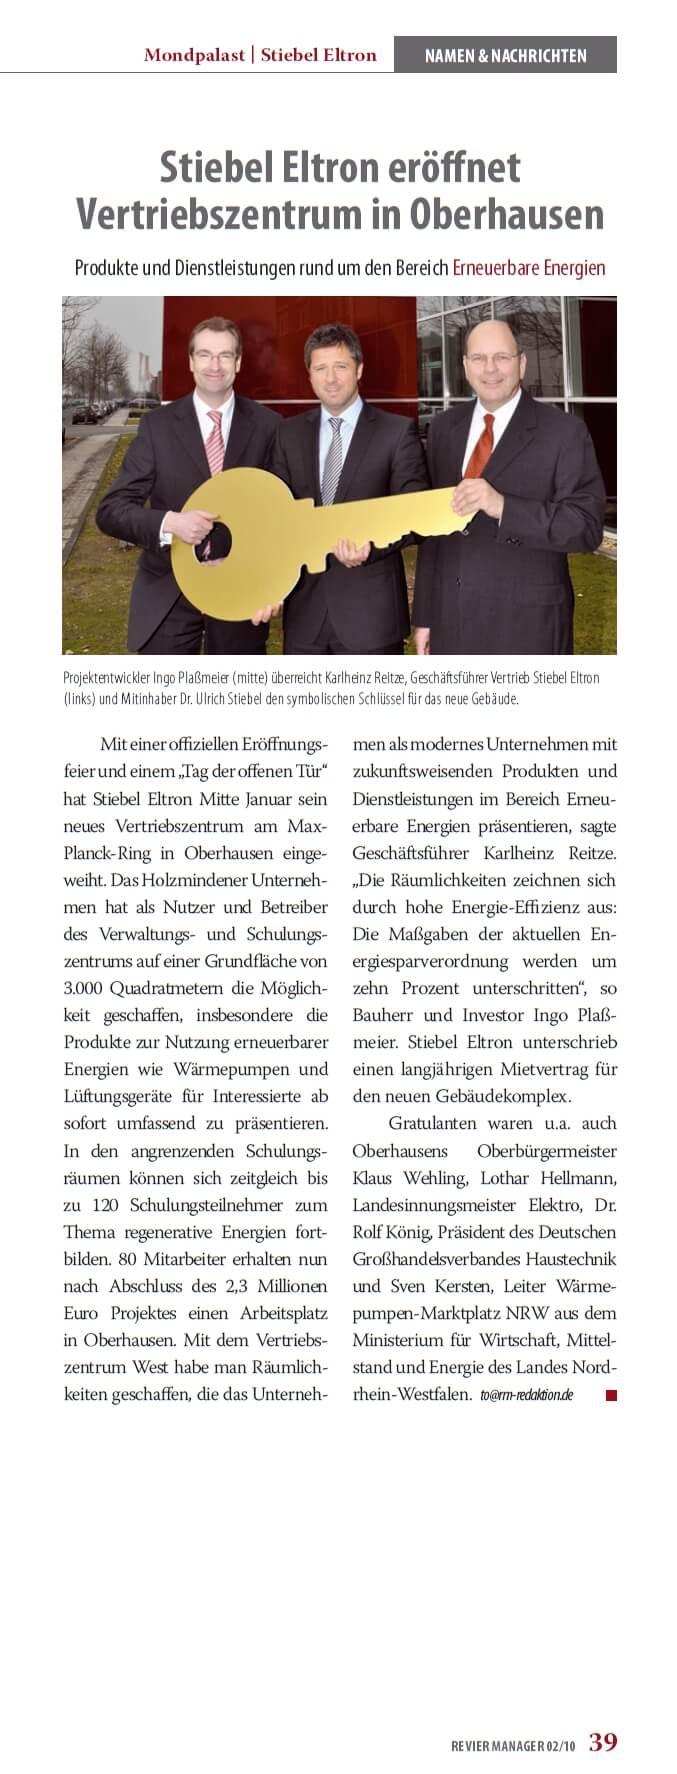 Revier Manager – Stiebel Eltron eröffnet Niederlassung Oberhausen